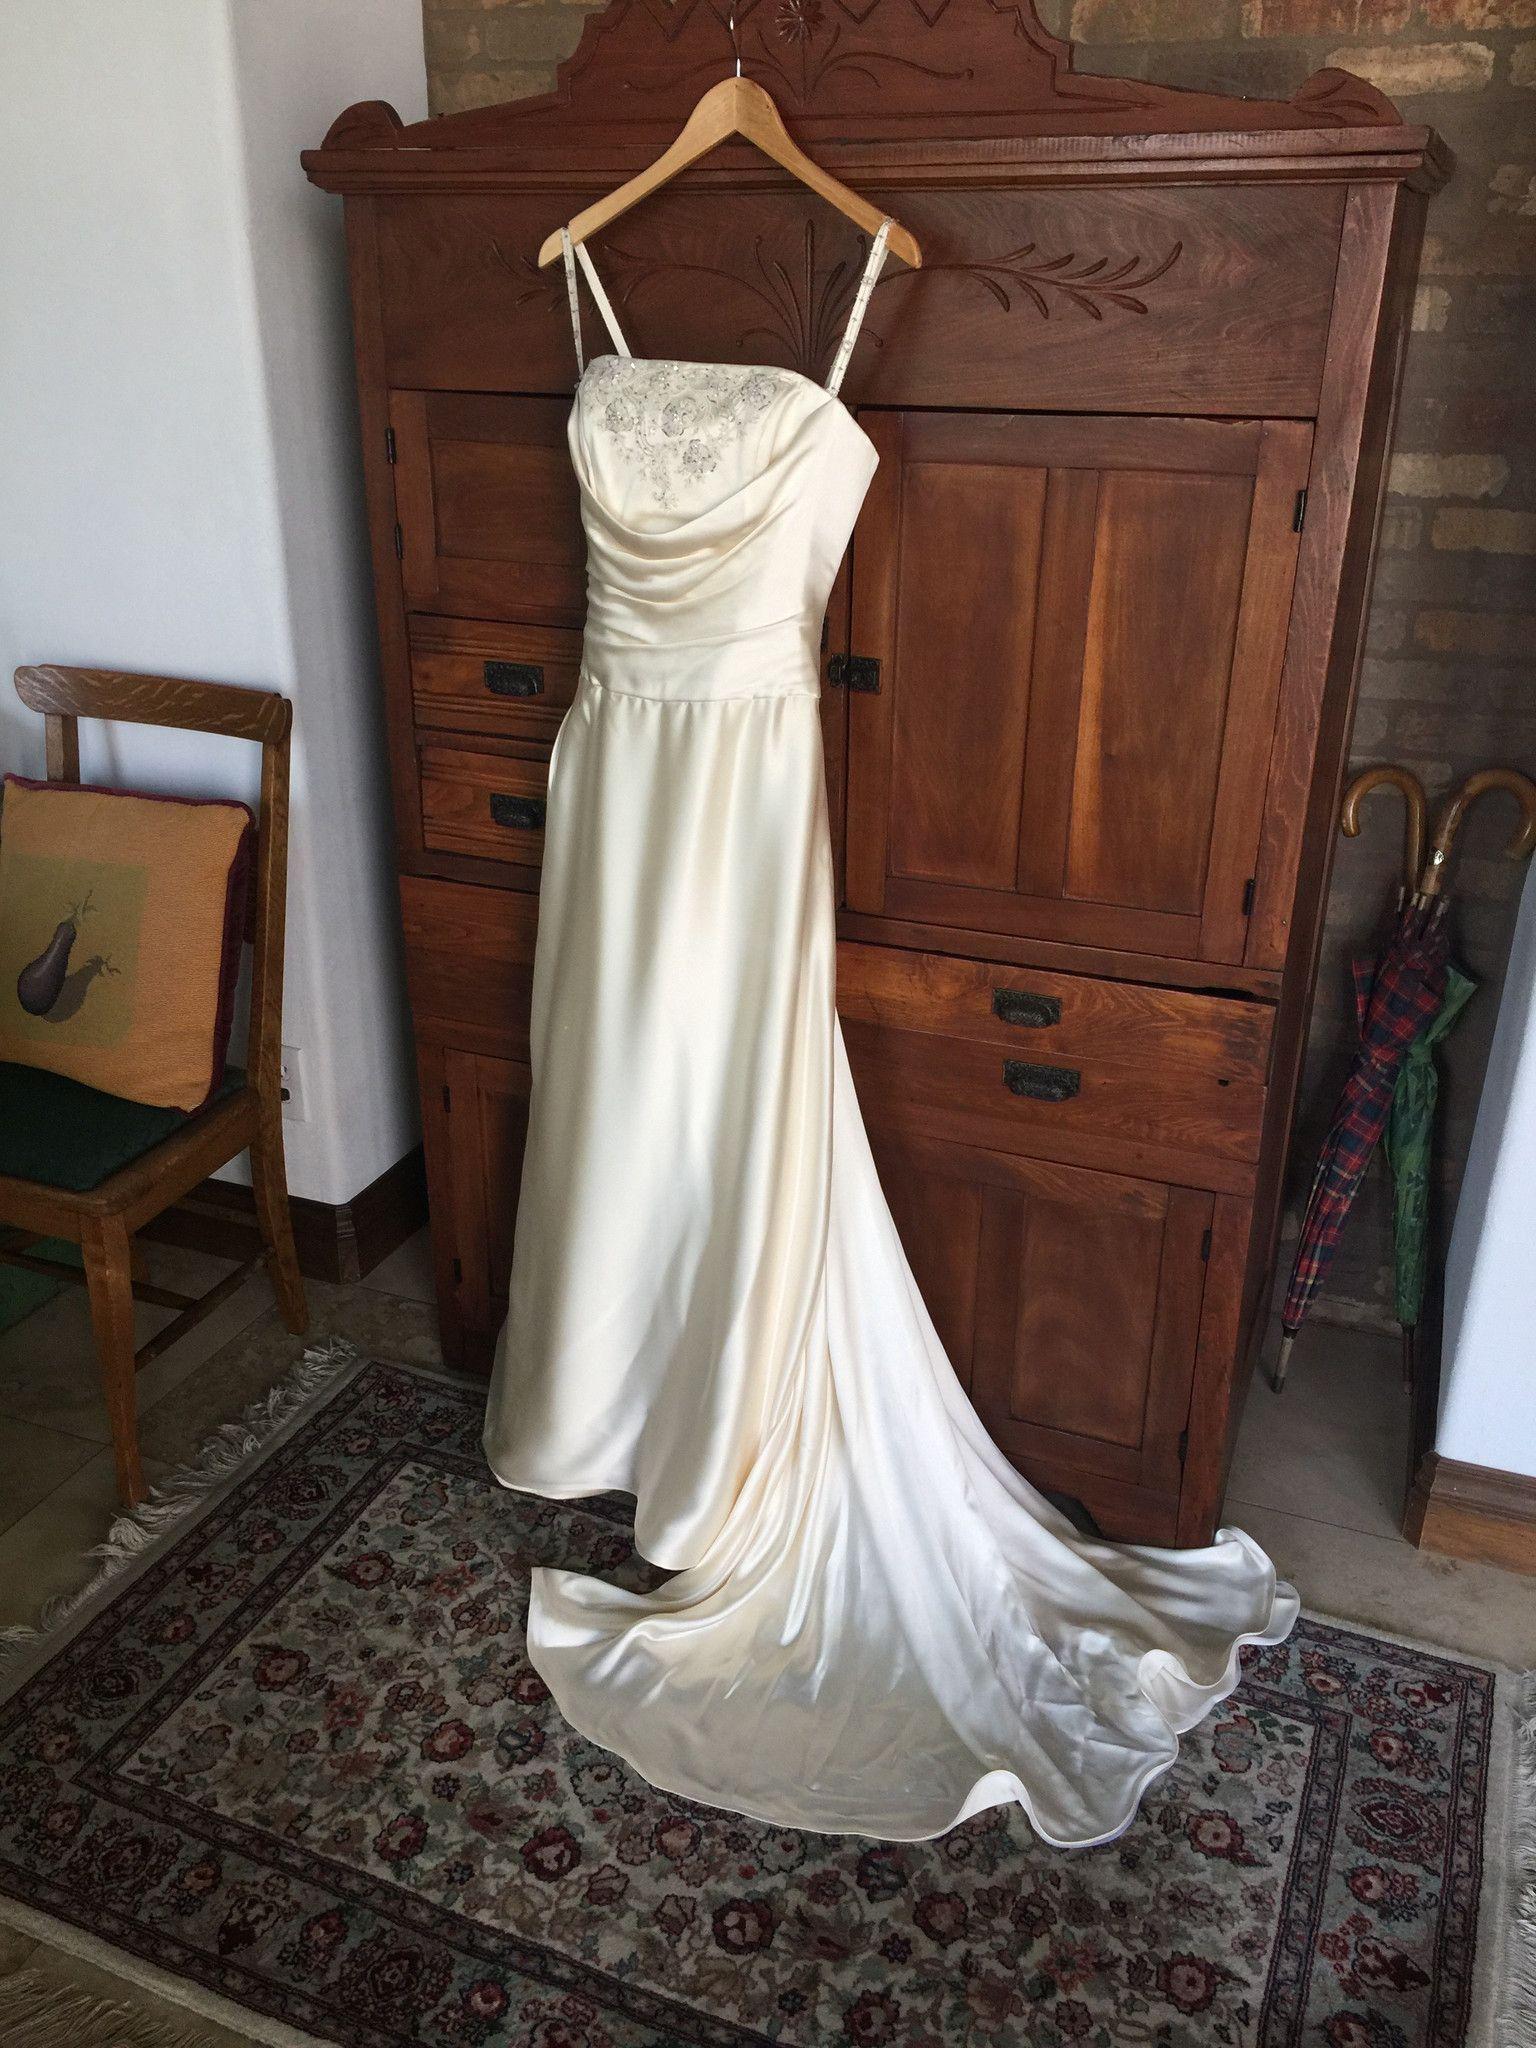 Wedding dress boxing  Yolanda uIreneu  Wedding boxes Wedding dress and Weddings